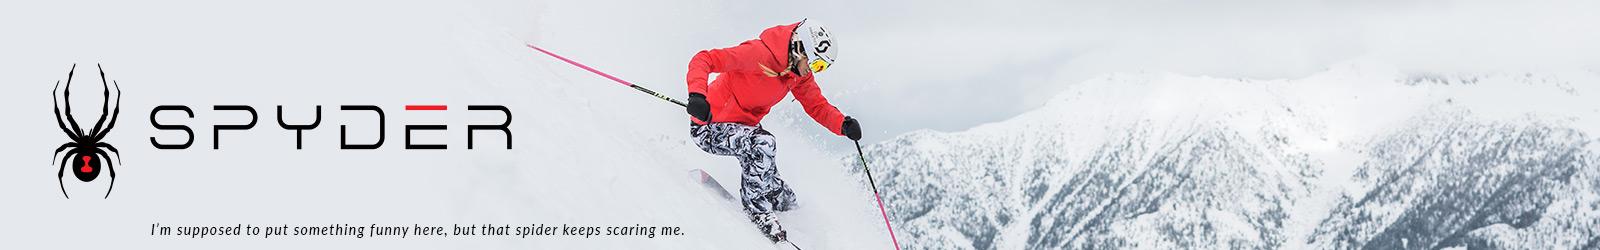 372c635d9 Spyder Ski Jackets and Clothing - Moosejaw